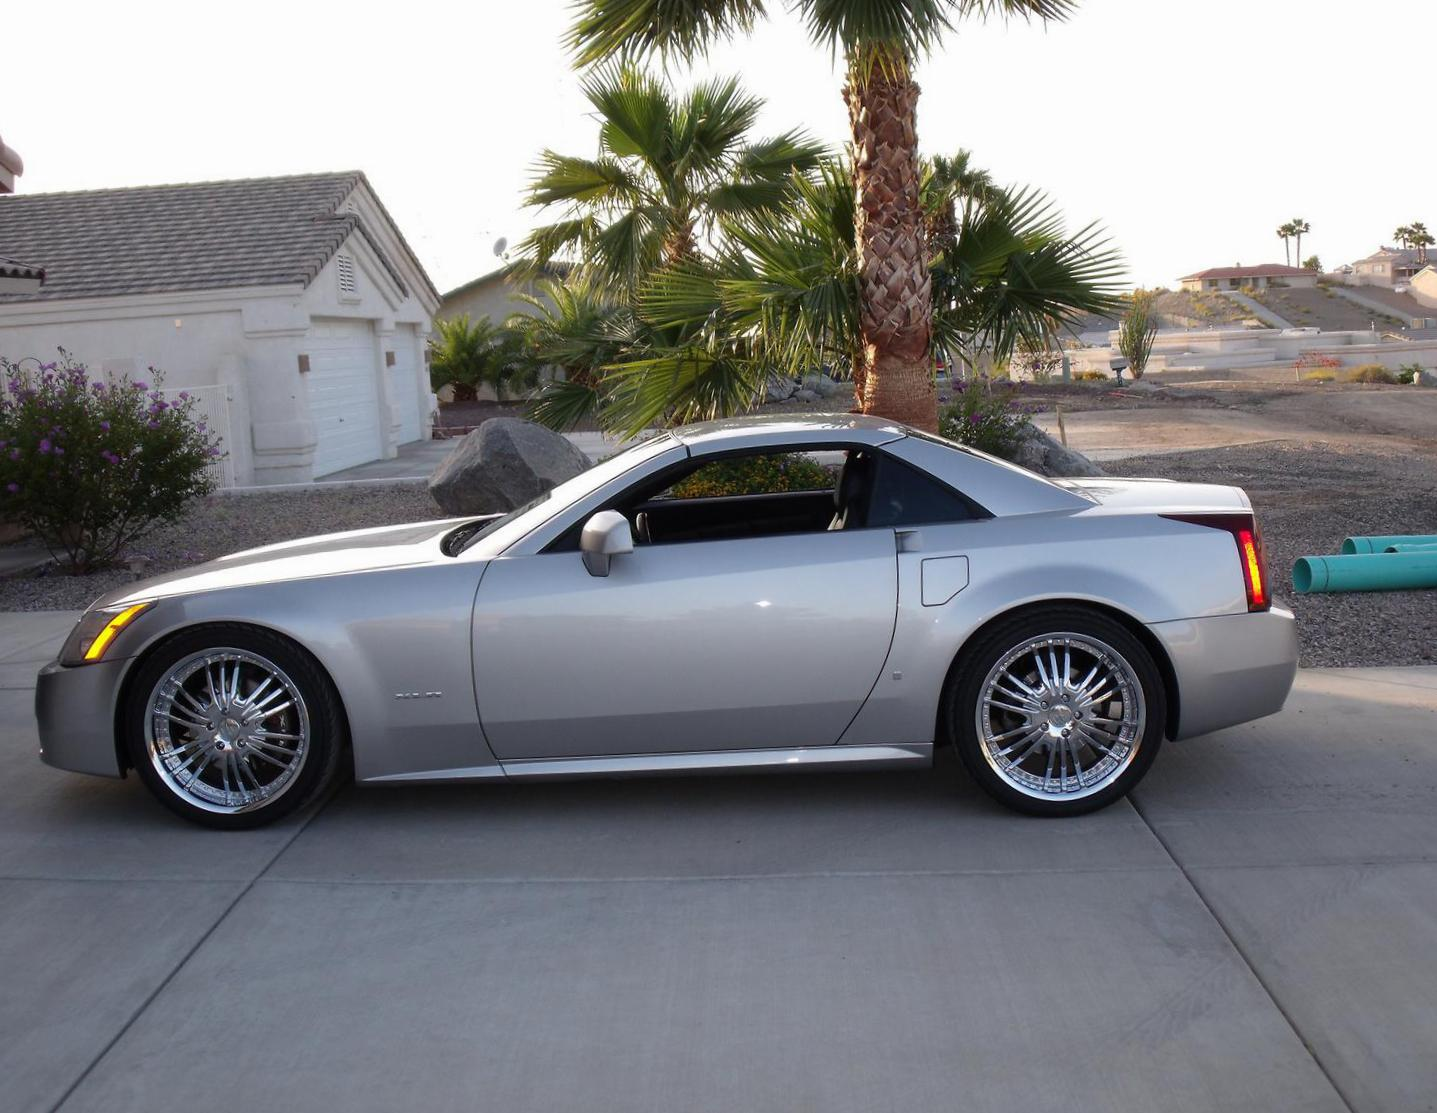 Cadillac XLR Photos and Specs. Photo: XLR Cadillac price and 26 ...